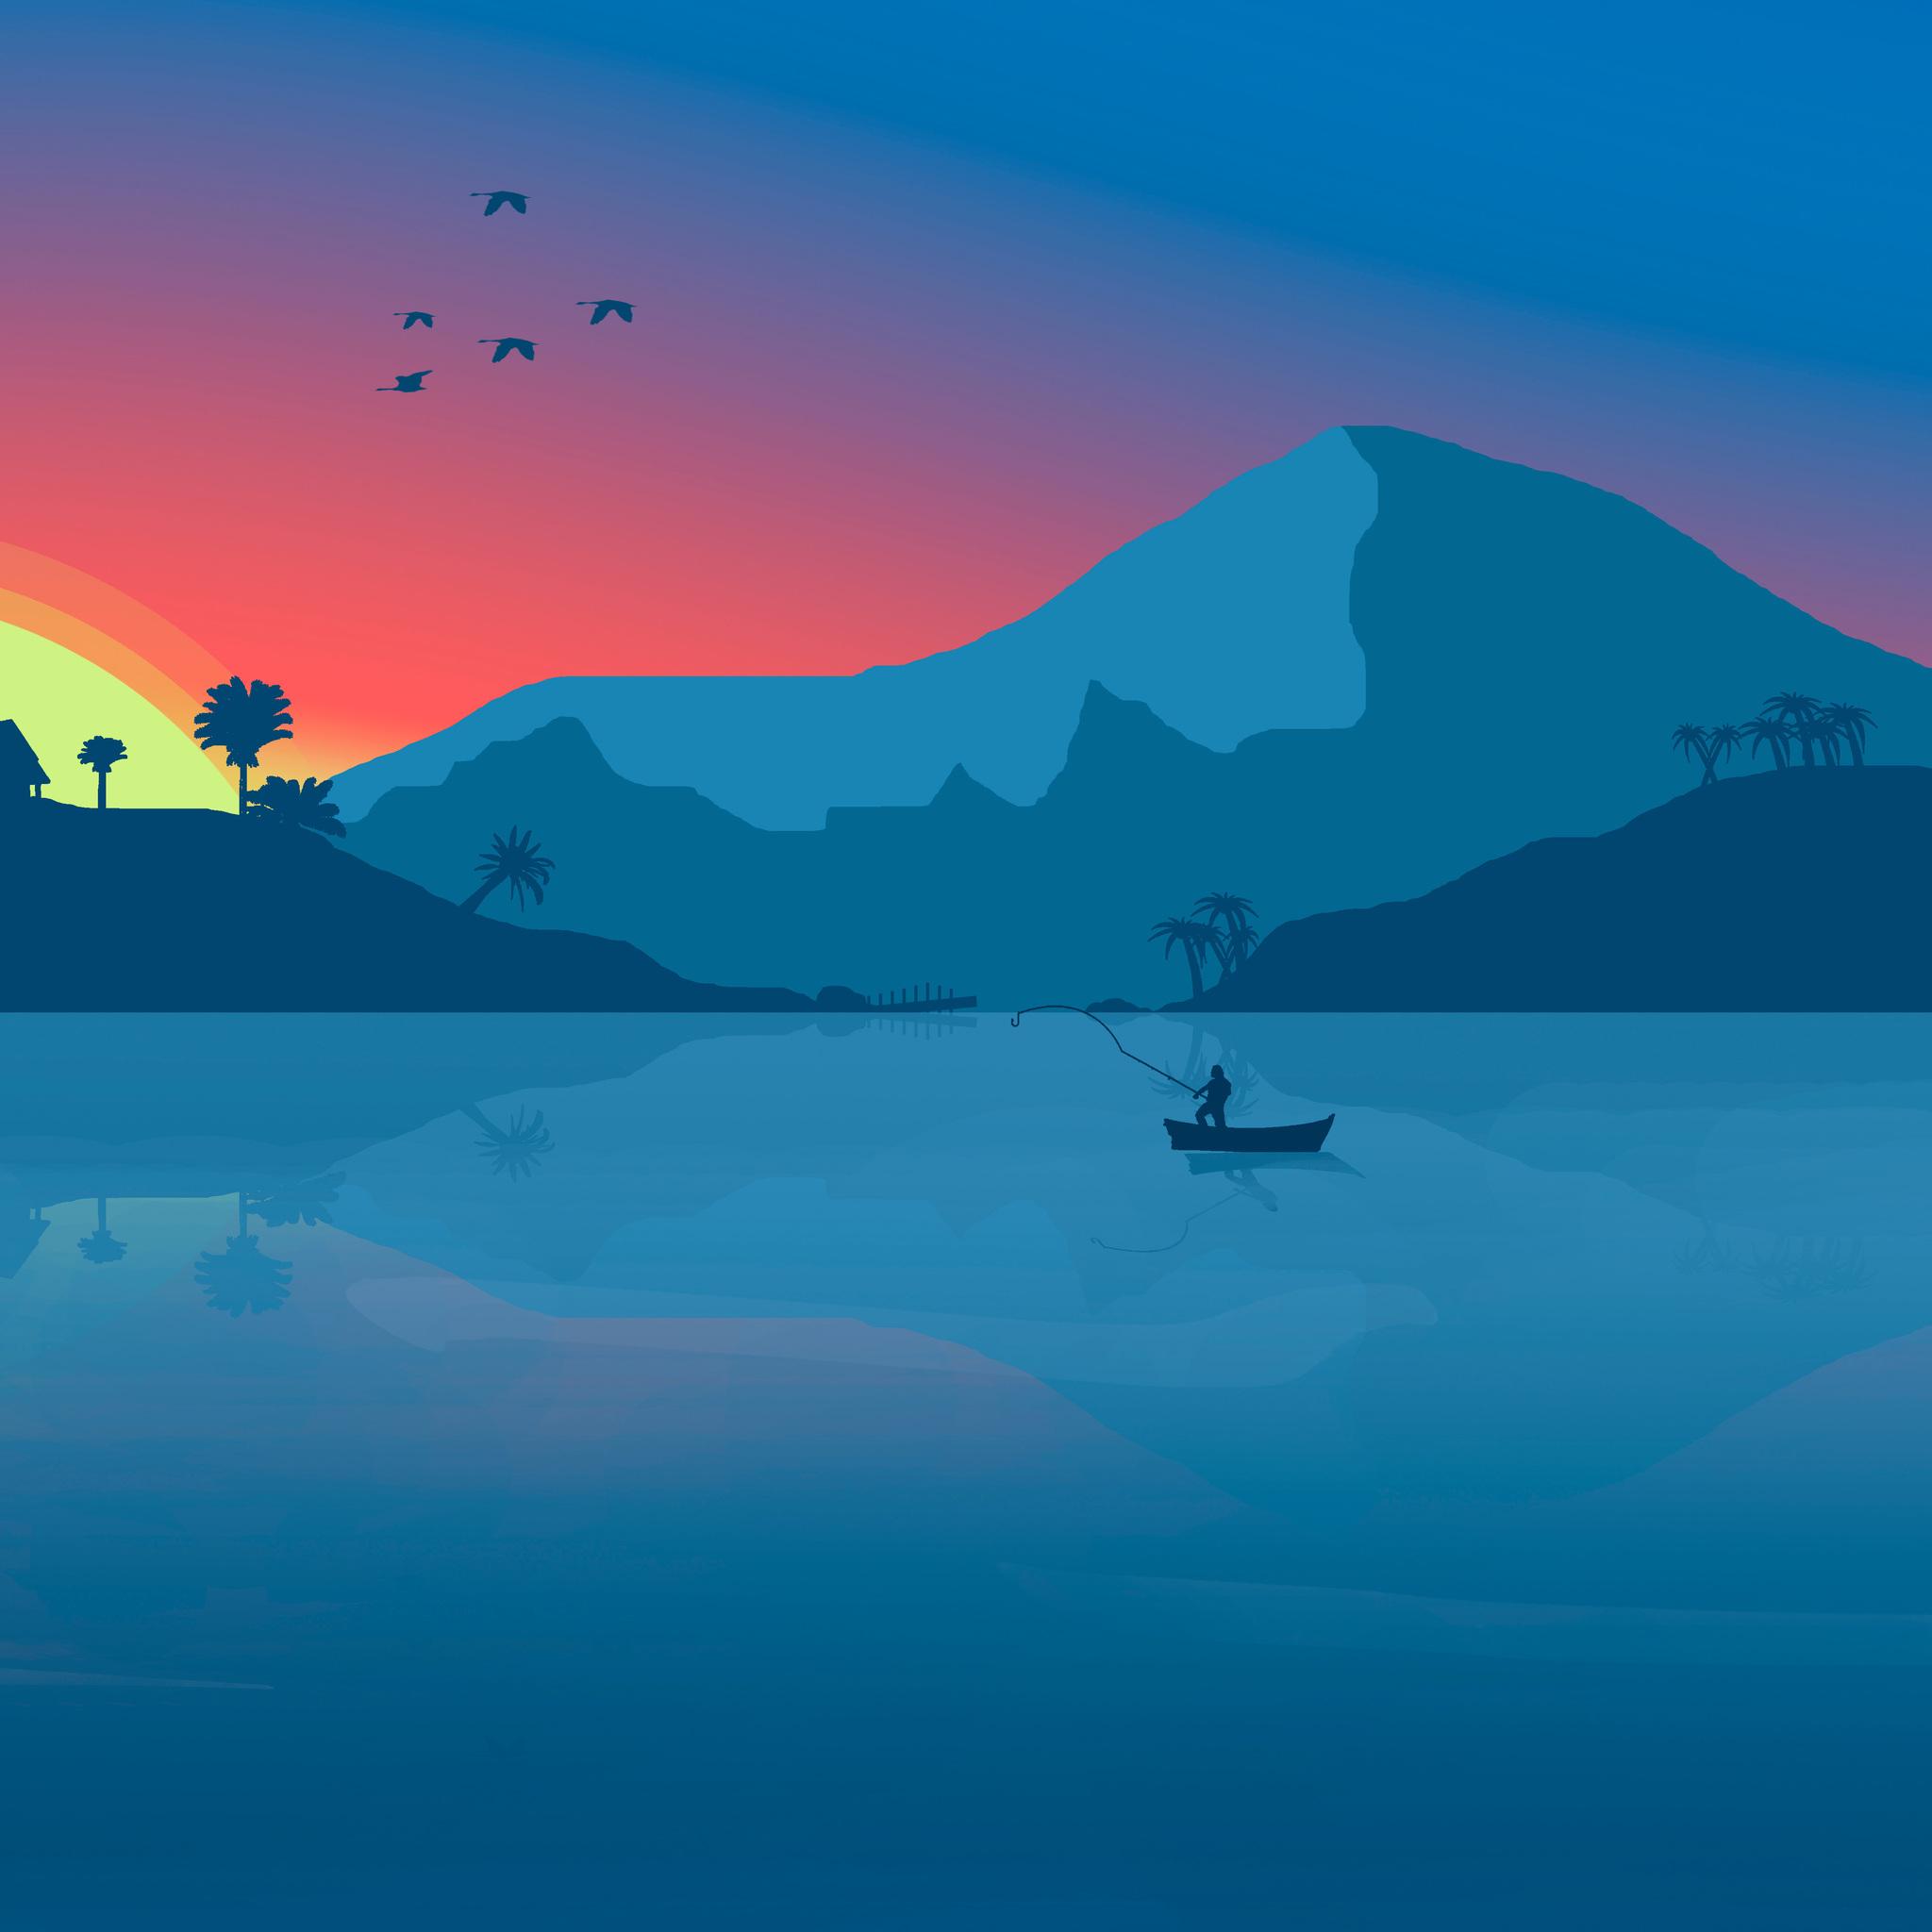 minimalist-beach-boat-mountains-sunset-birds-8k-db.